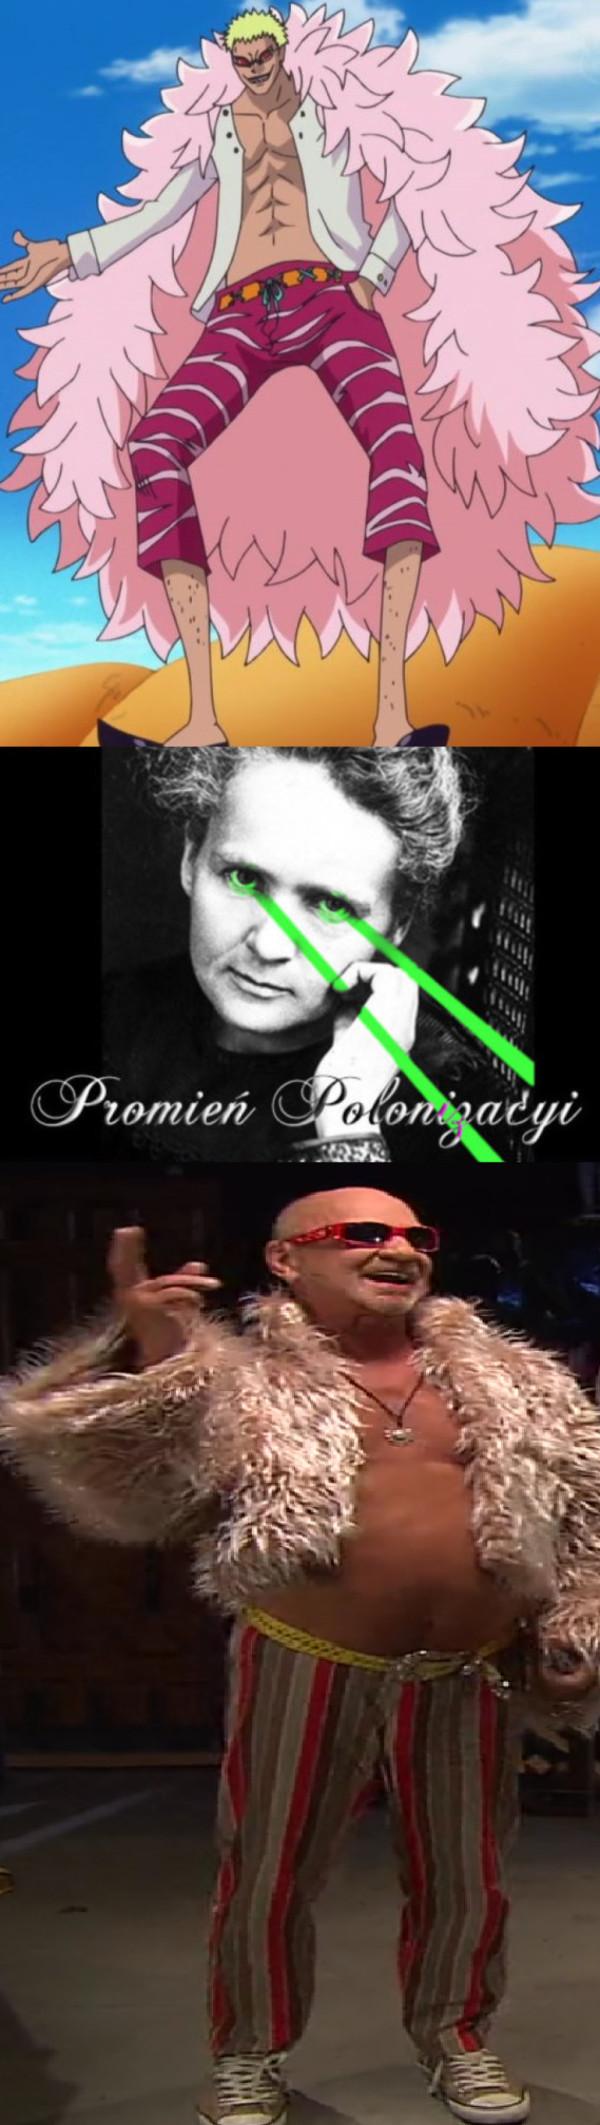 Promień Polonizacyi